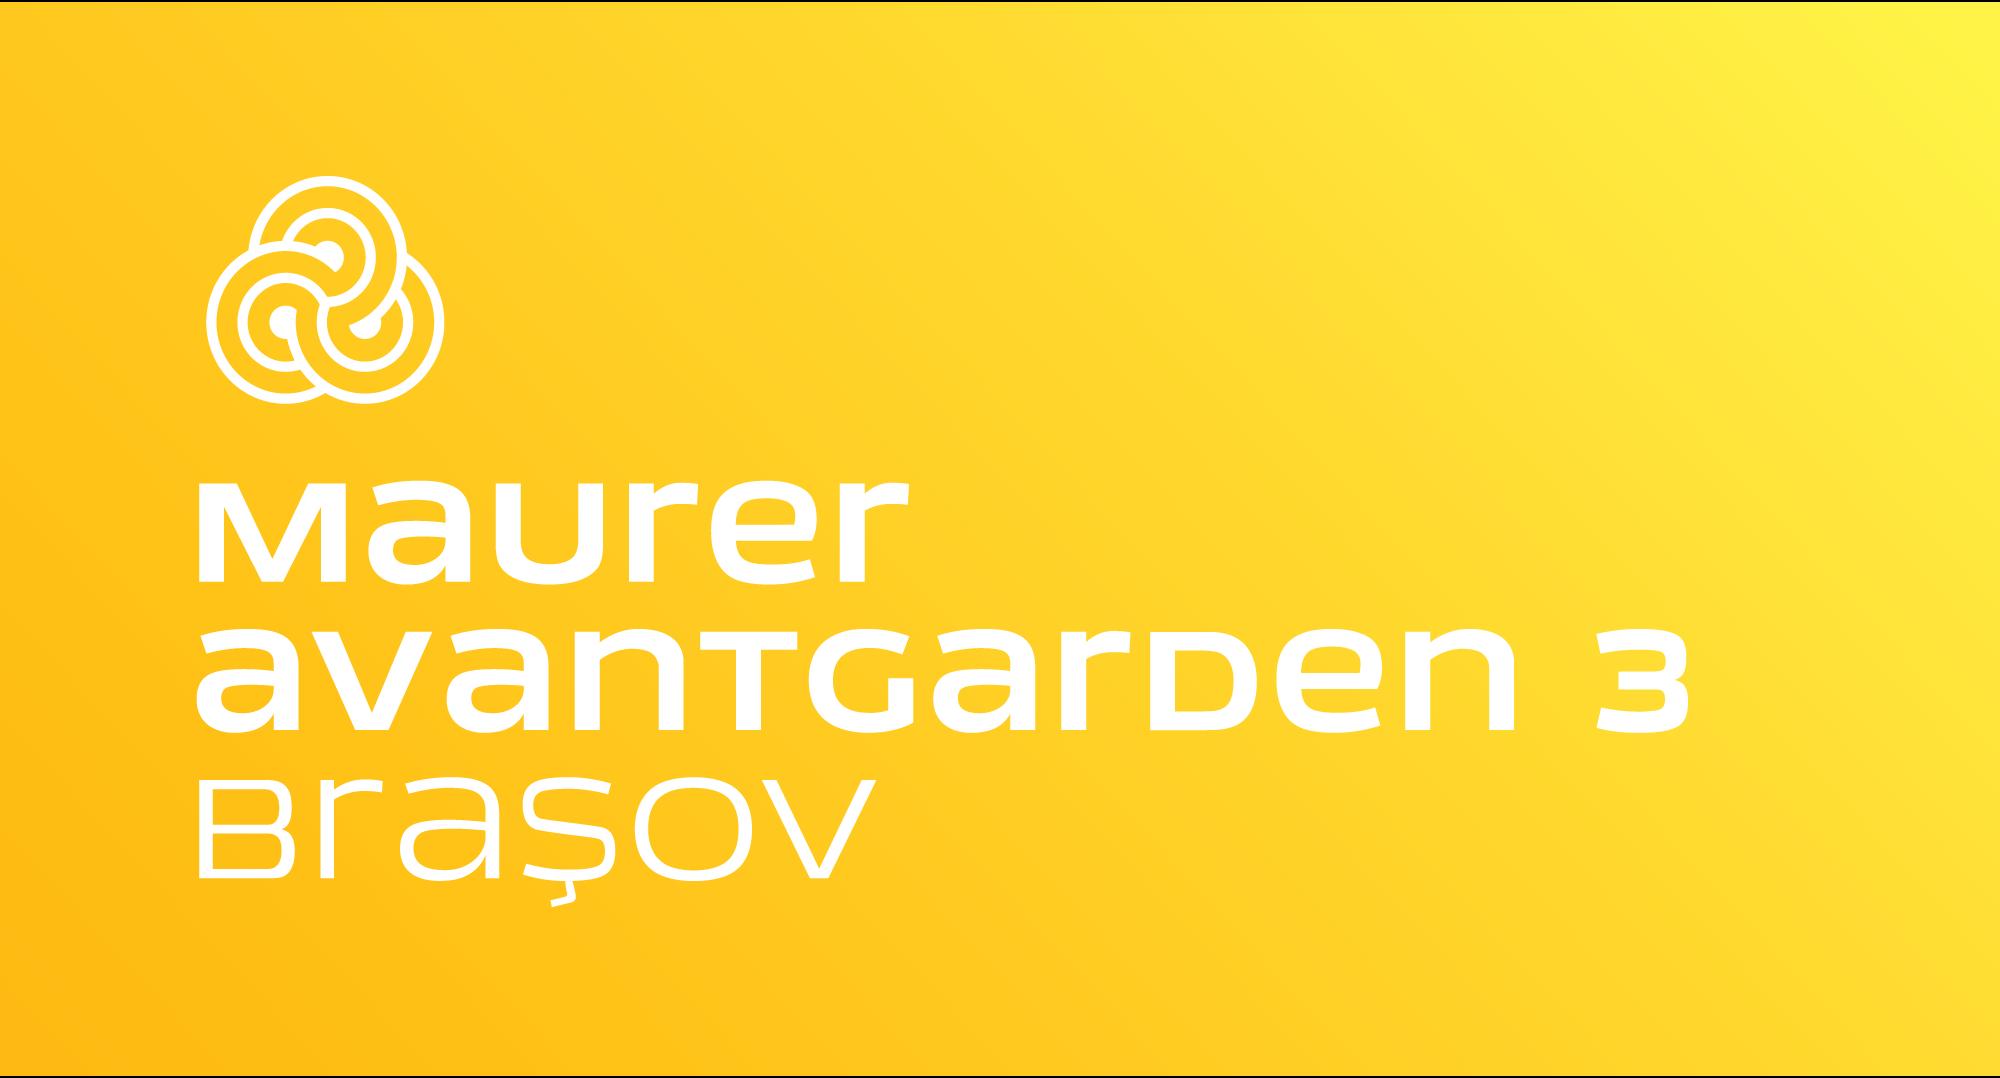 Avangarden3 Brasov Imobiliare